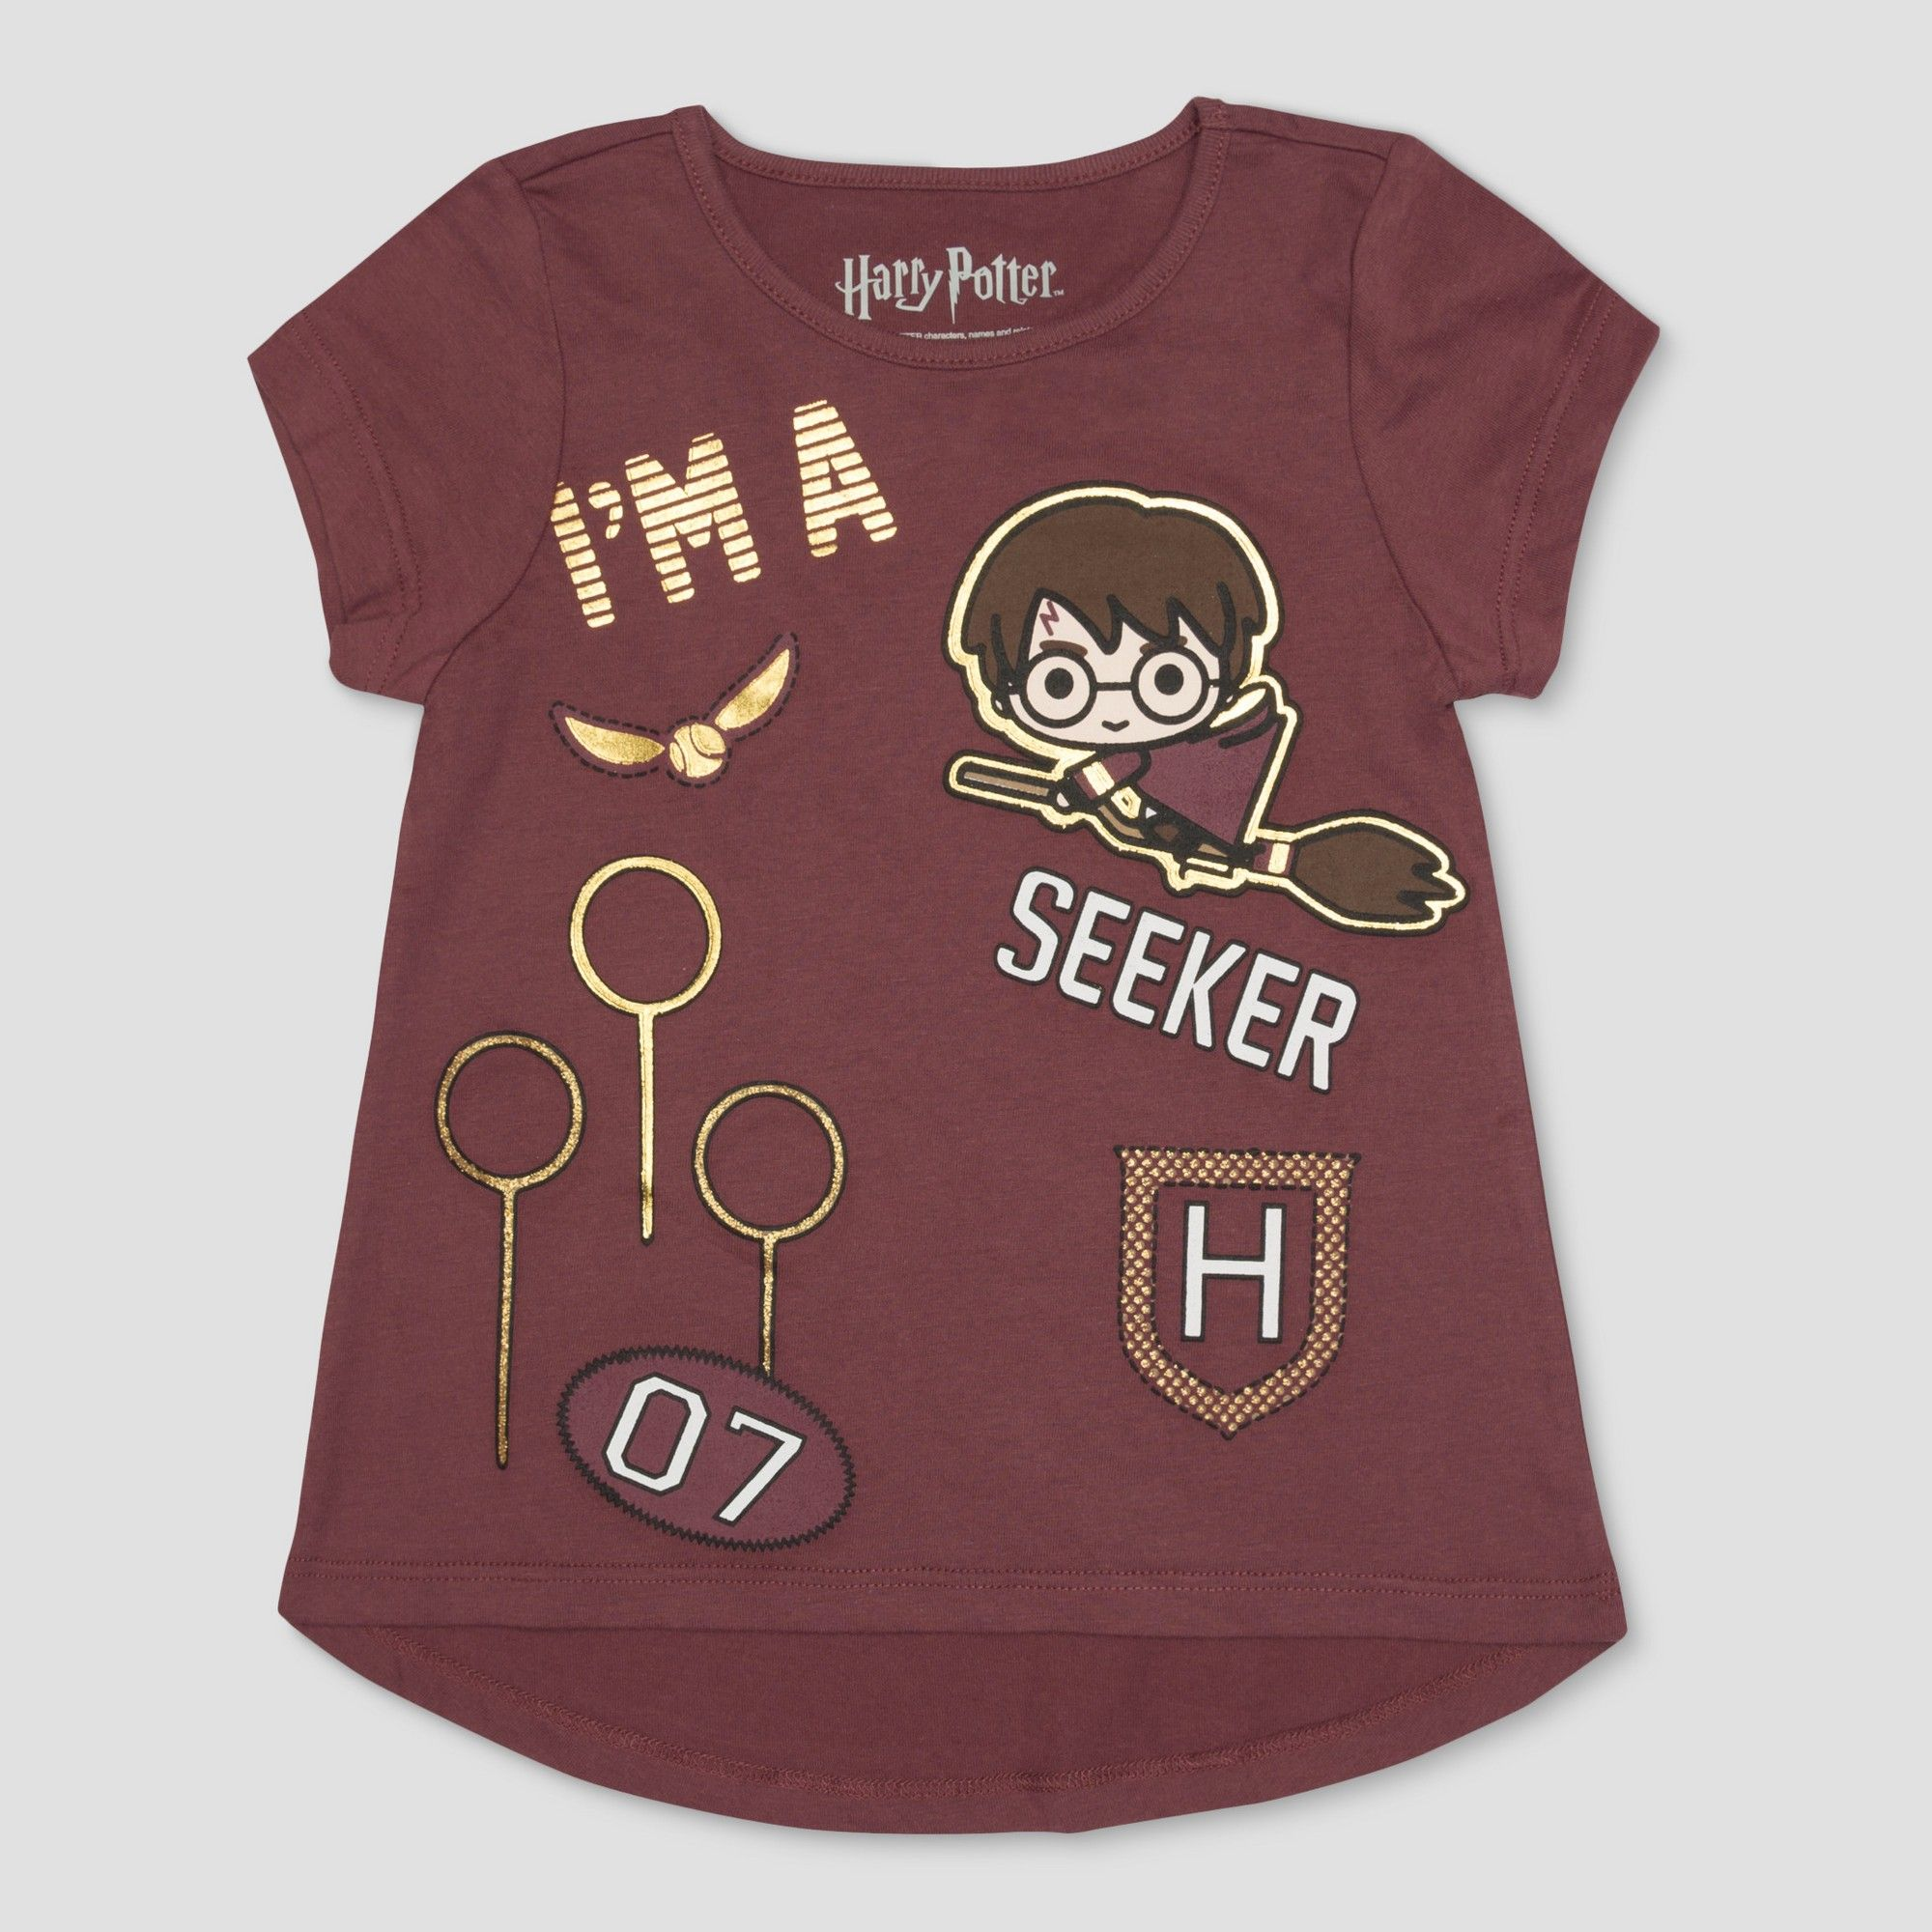 Petitetoddler Girls Harry Potter I M A Seeker Short Sleeve T Shirt Brown 12 M Girl S Size Medium Red Harry Potter Outfits Toddler Girl Harry Potter Shirts